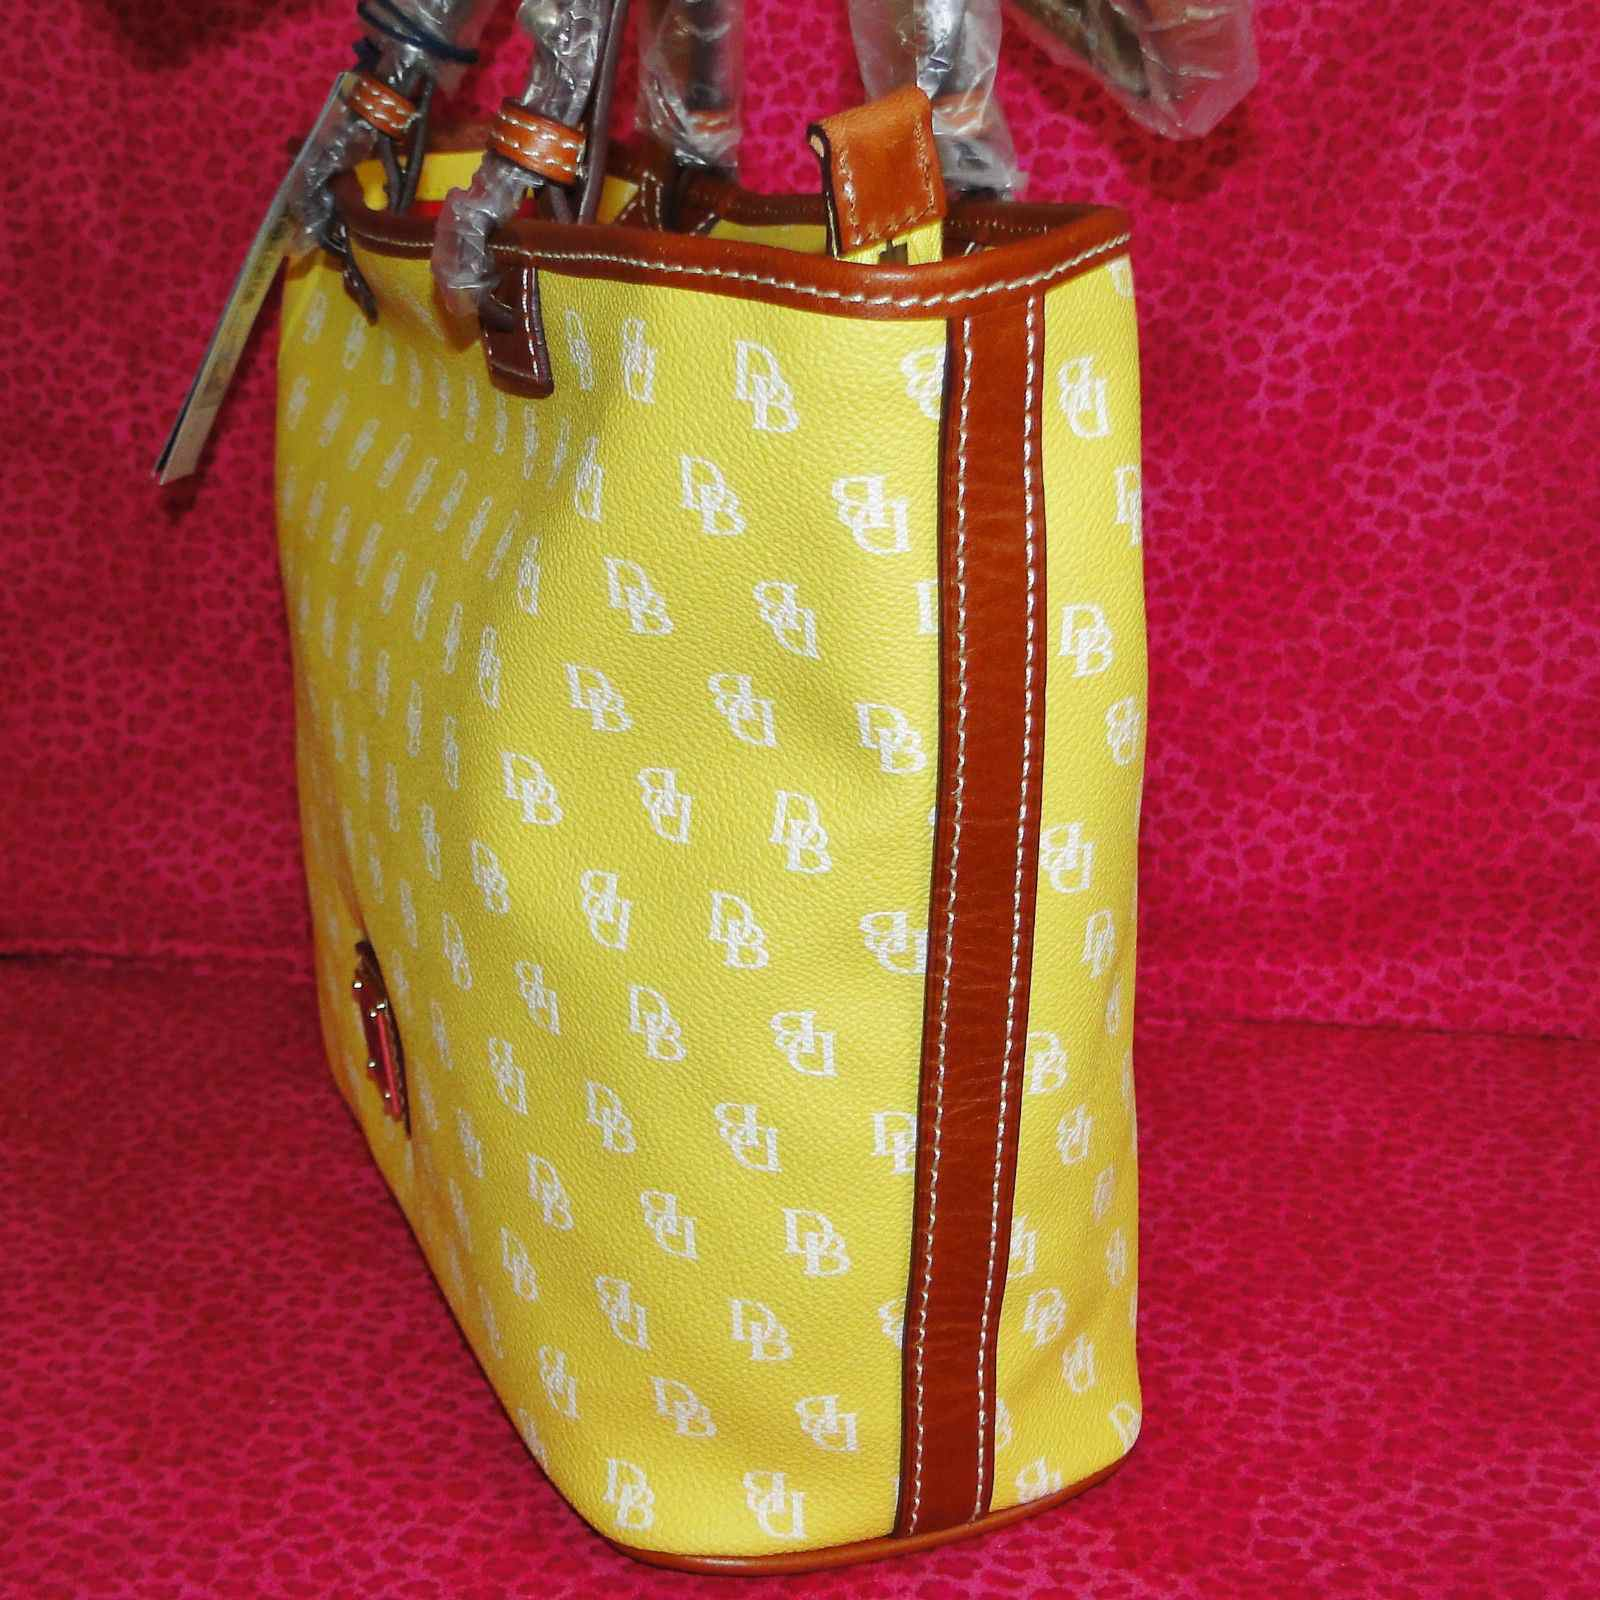 NWT Dooney & Bourke Gretta Signature Yellow Leisure Shopper Tote